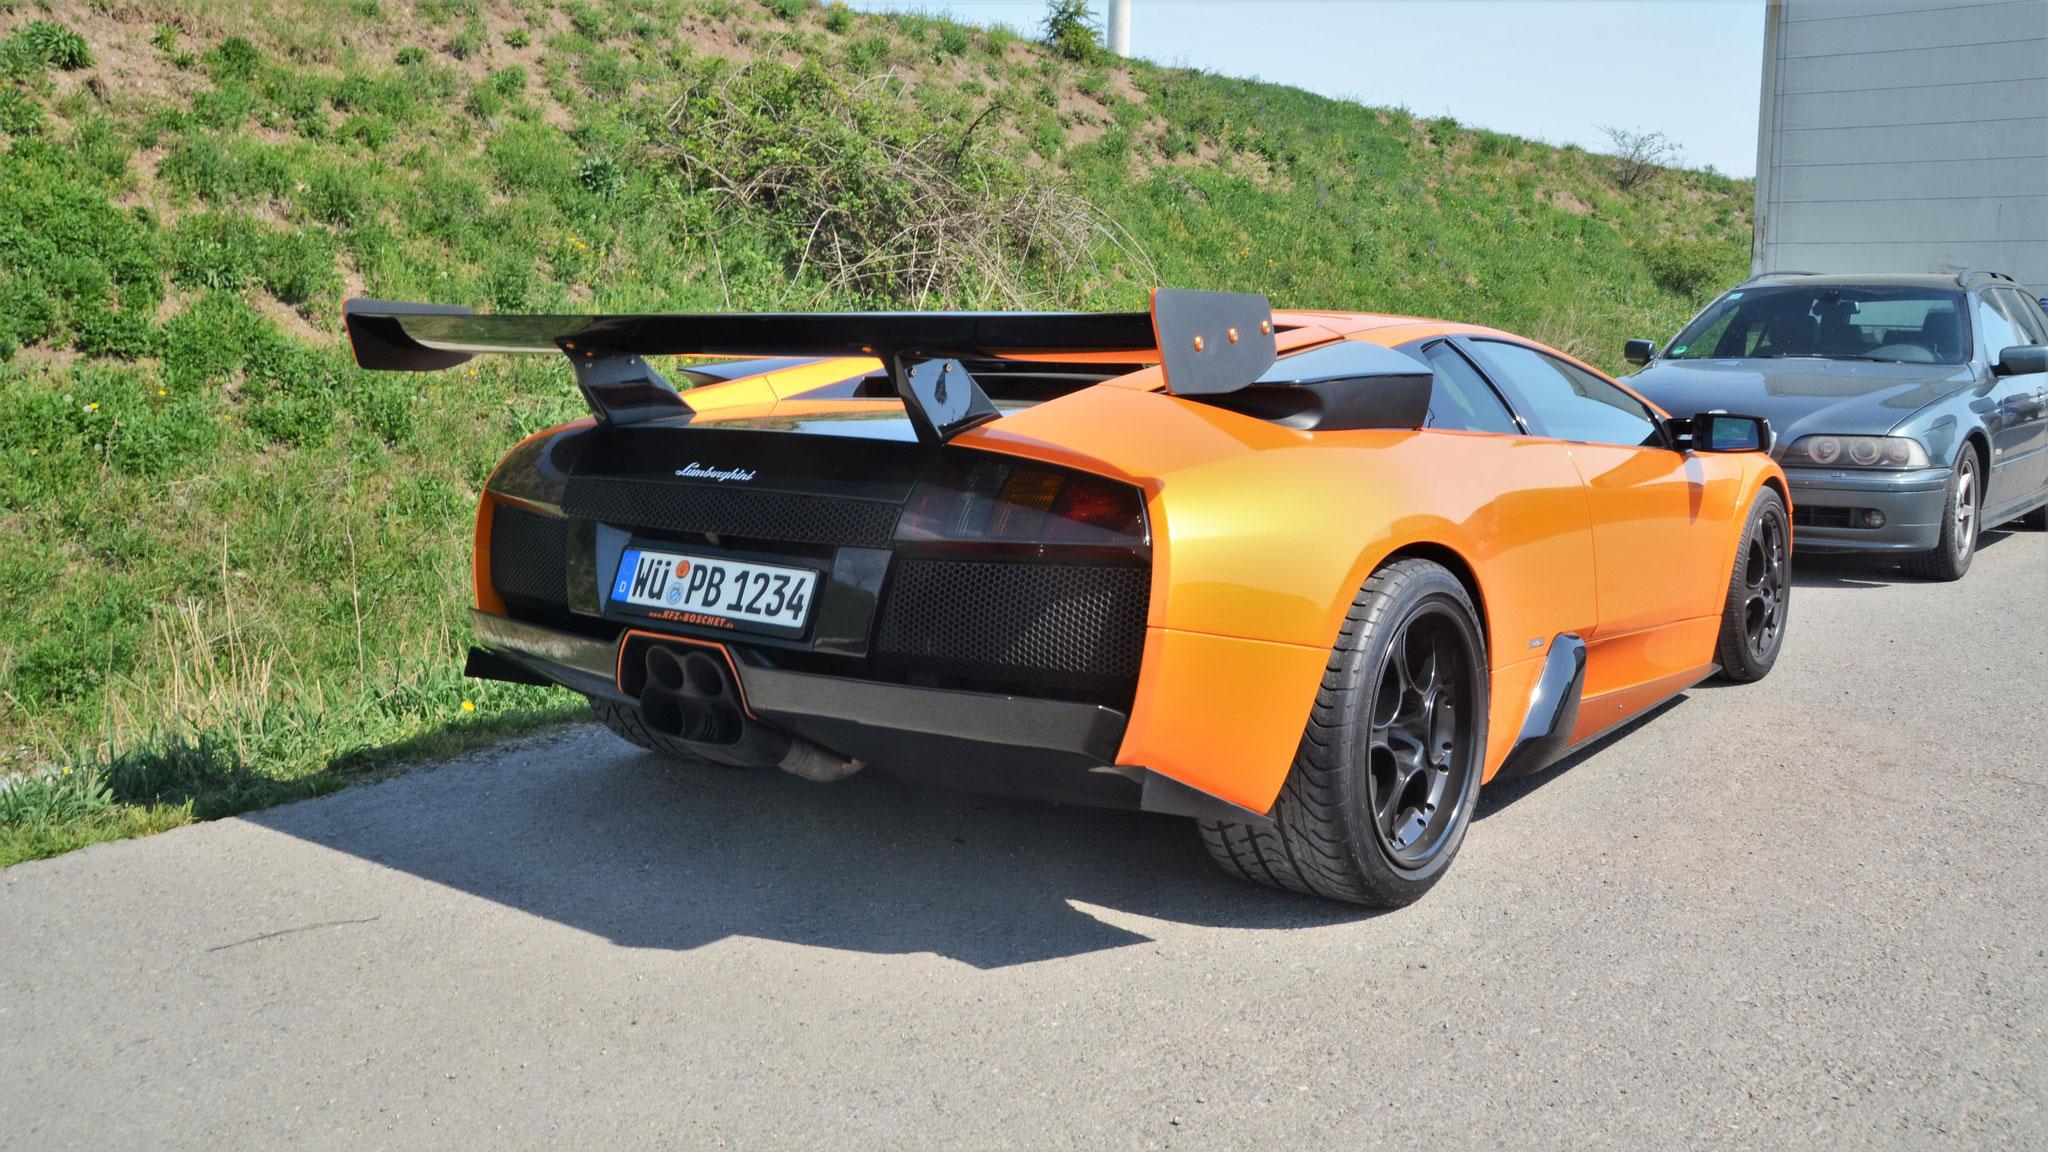 Lamborghini Murcielago - WÜ-PB-1234